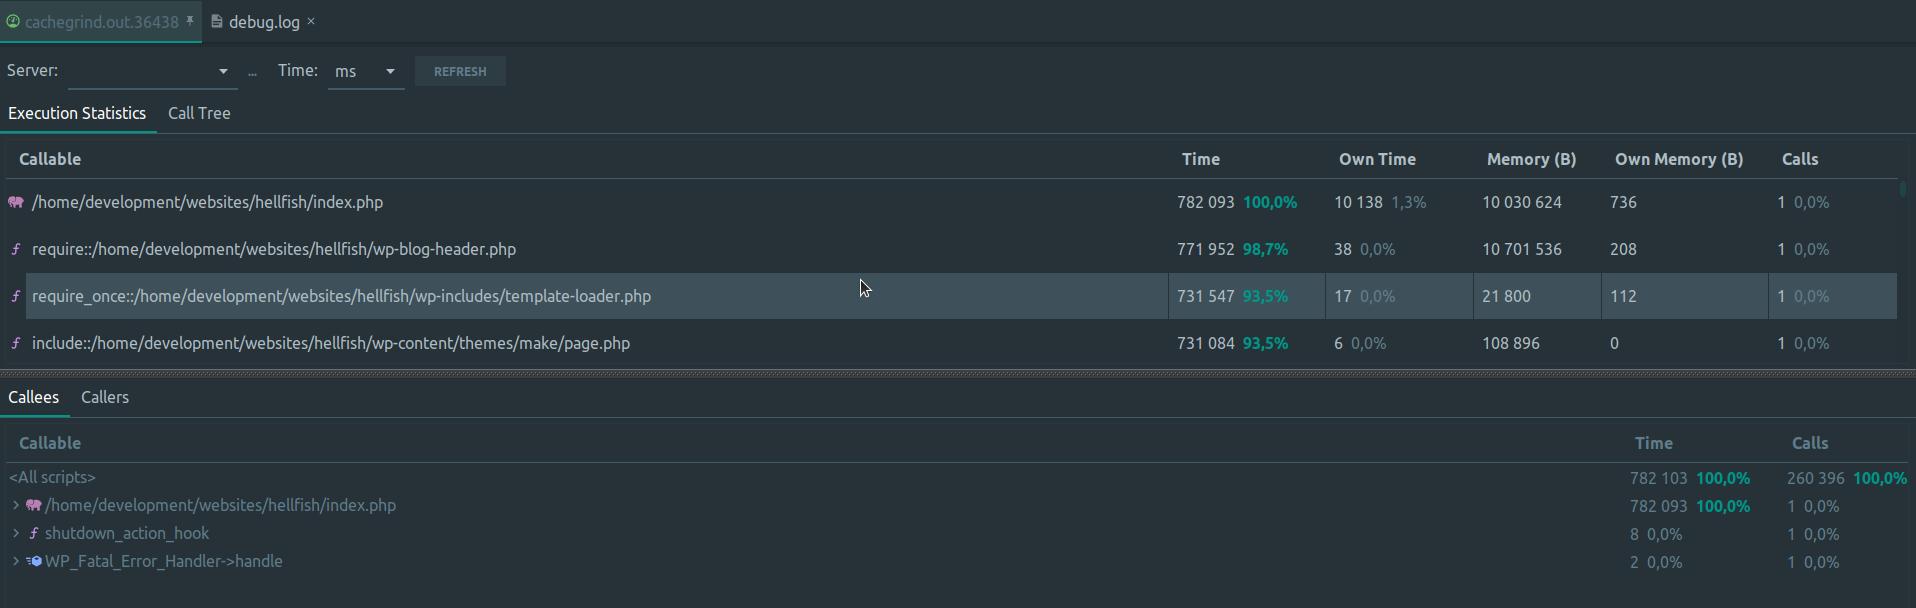 Analyzing Xdebug profile log in PhpStorm